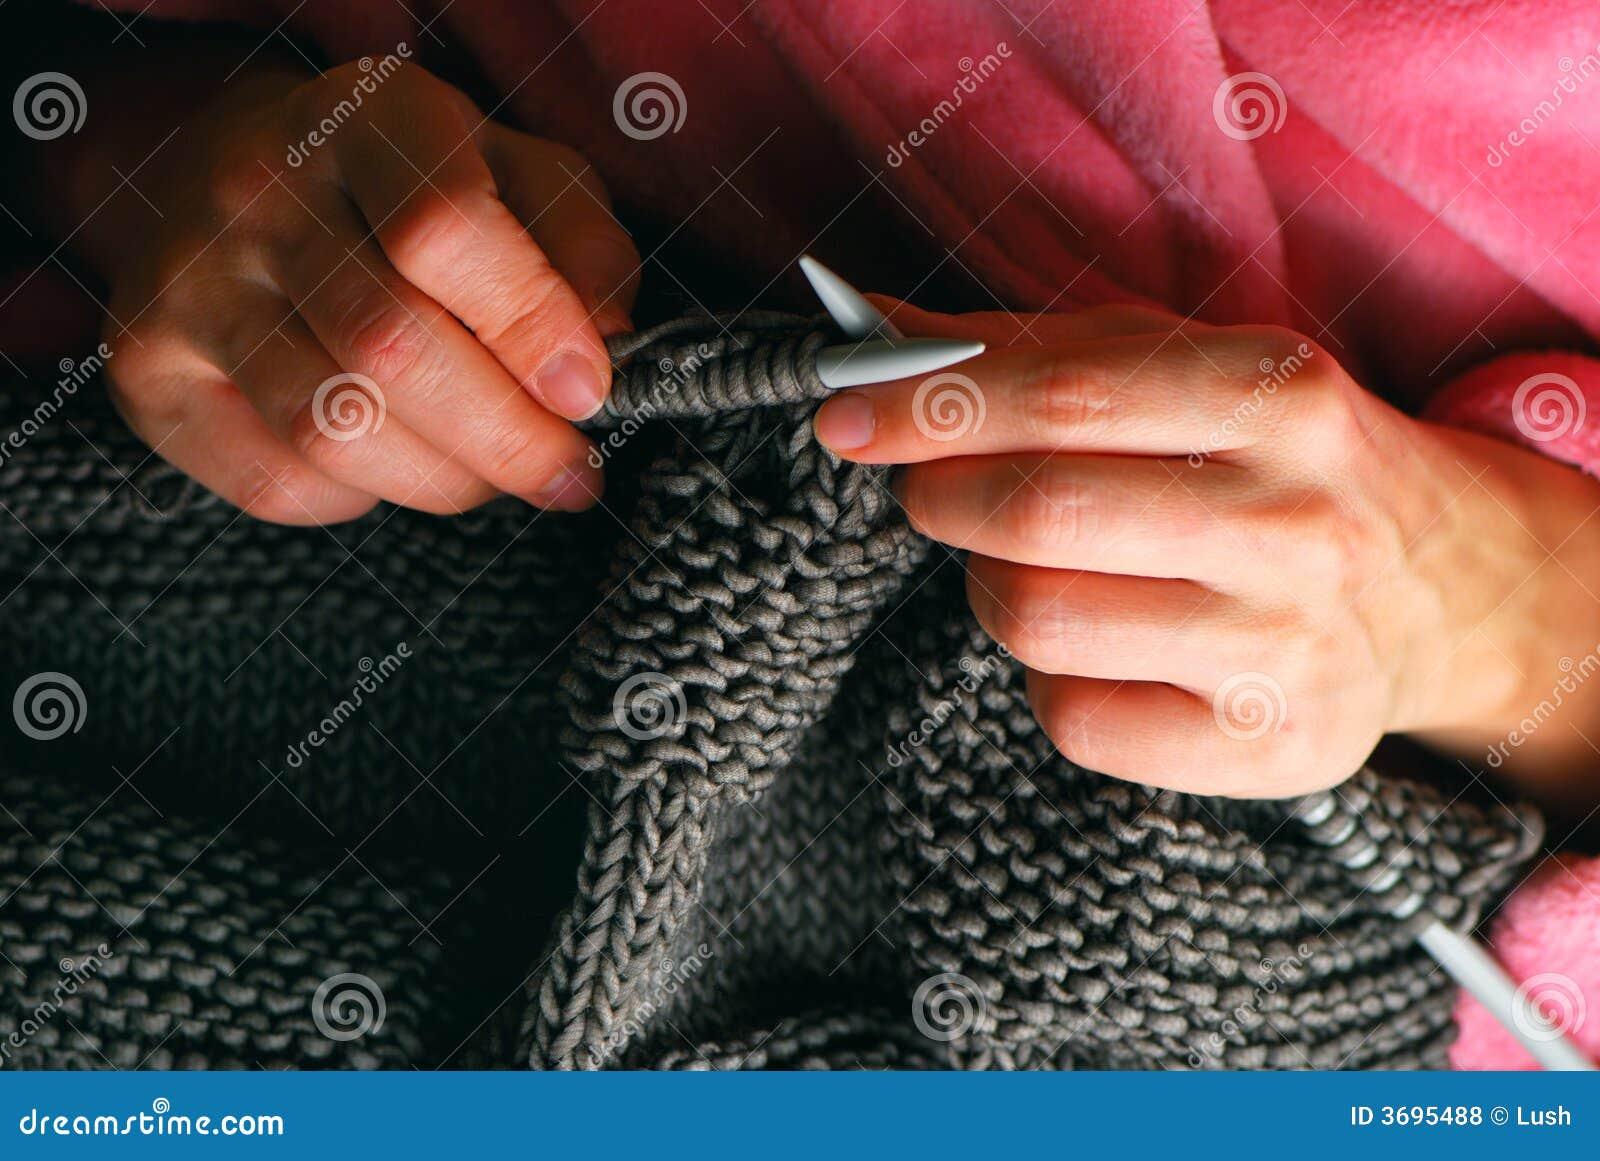 0c1fc7b78c4b γκρίζα χέρια που πλέκουν τις νεολαίες γυναικών πουλόβερ